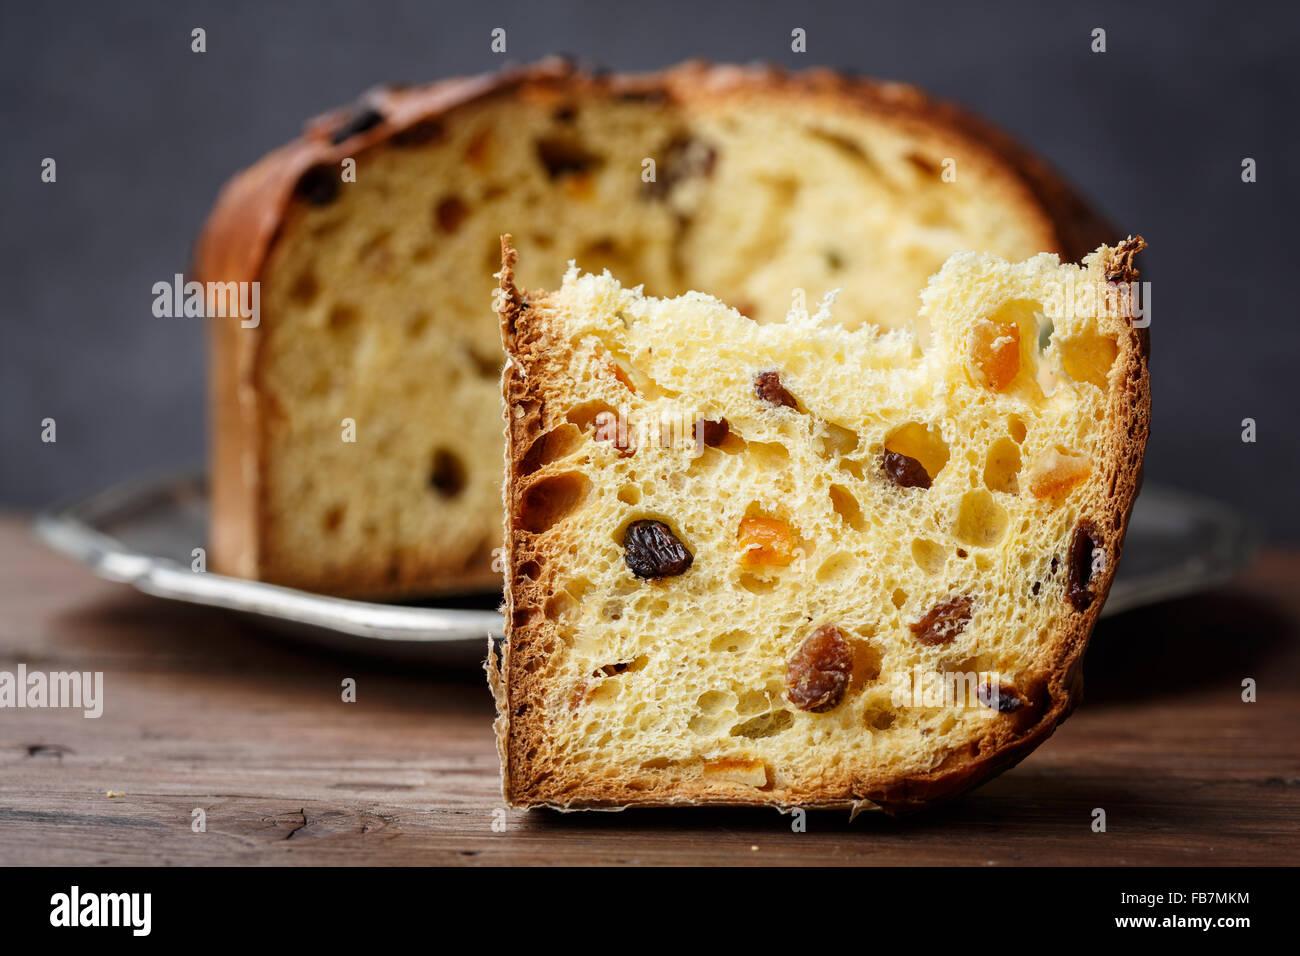 Panettone (Italian Christmas cake), sliced - Stock Image